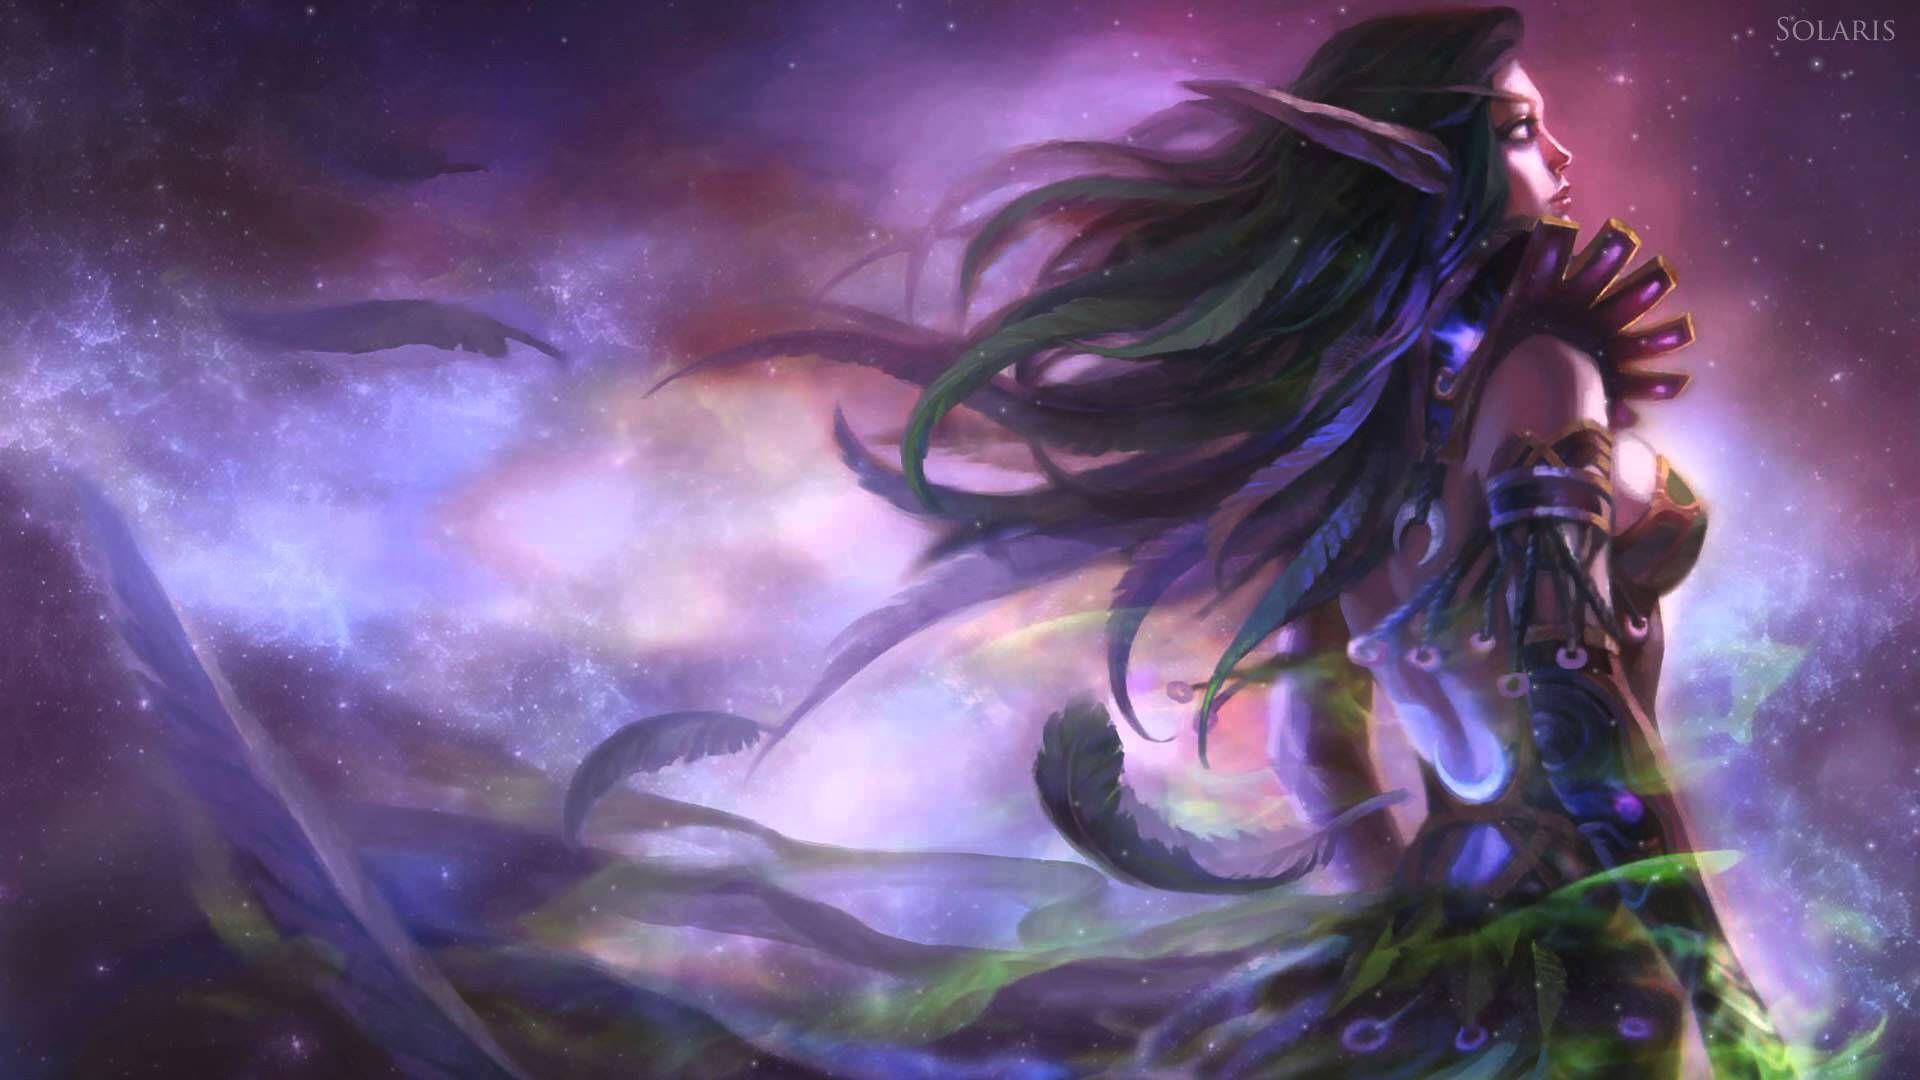 Night Elf Wallpaper Google Search World Of Warcraft Night Elf Warcraft Art